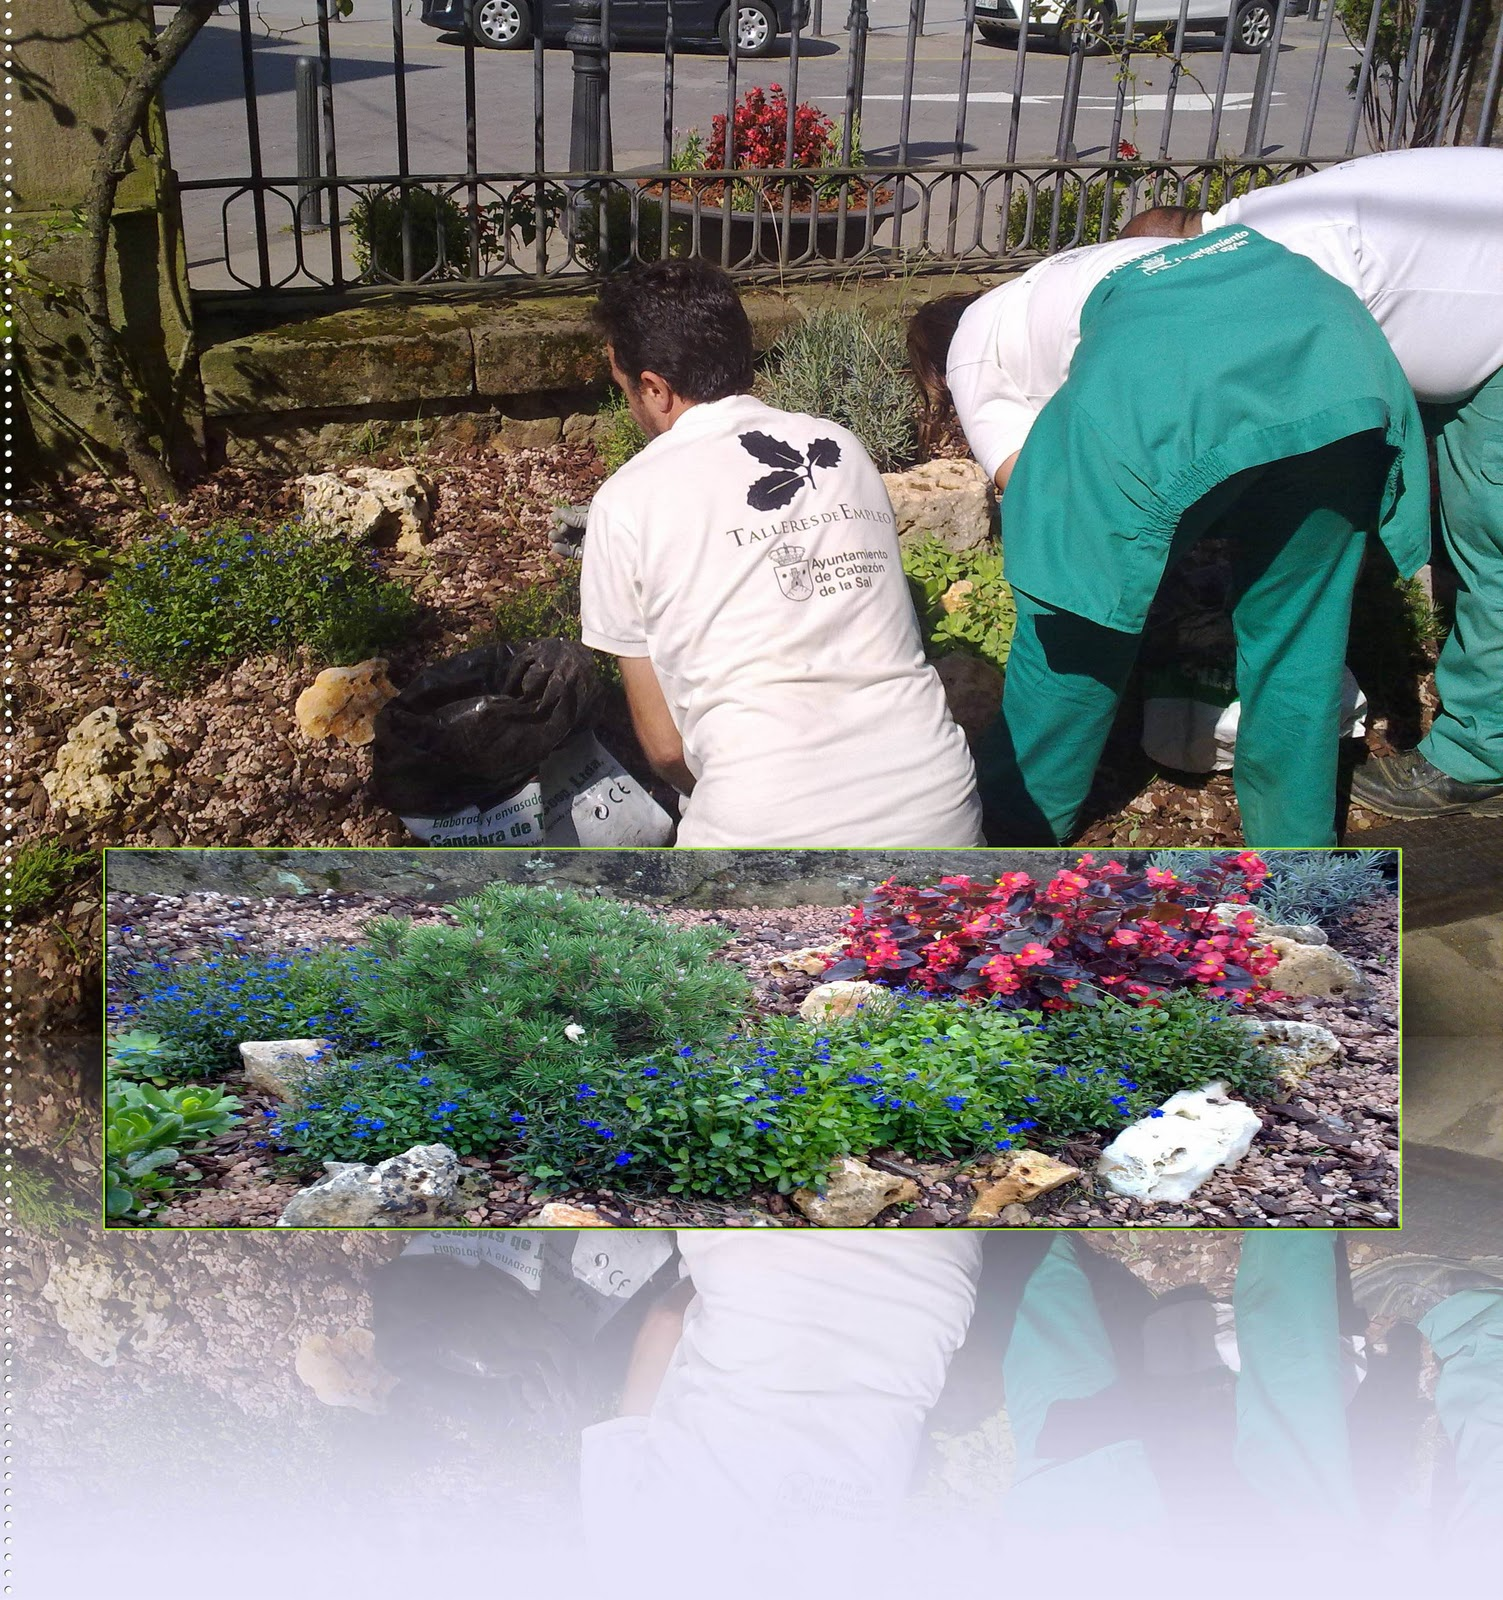 Taller de empleo cabez n de la sal mantenimiento de la for Trabajo de mantenimiento de jardines